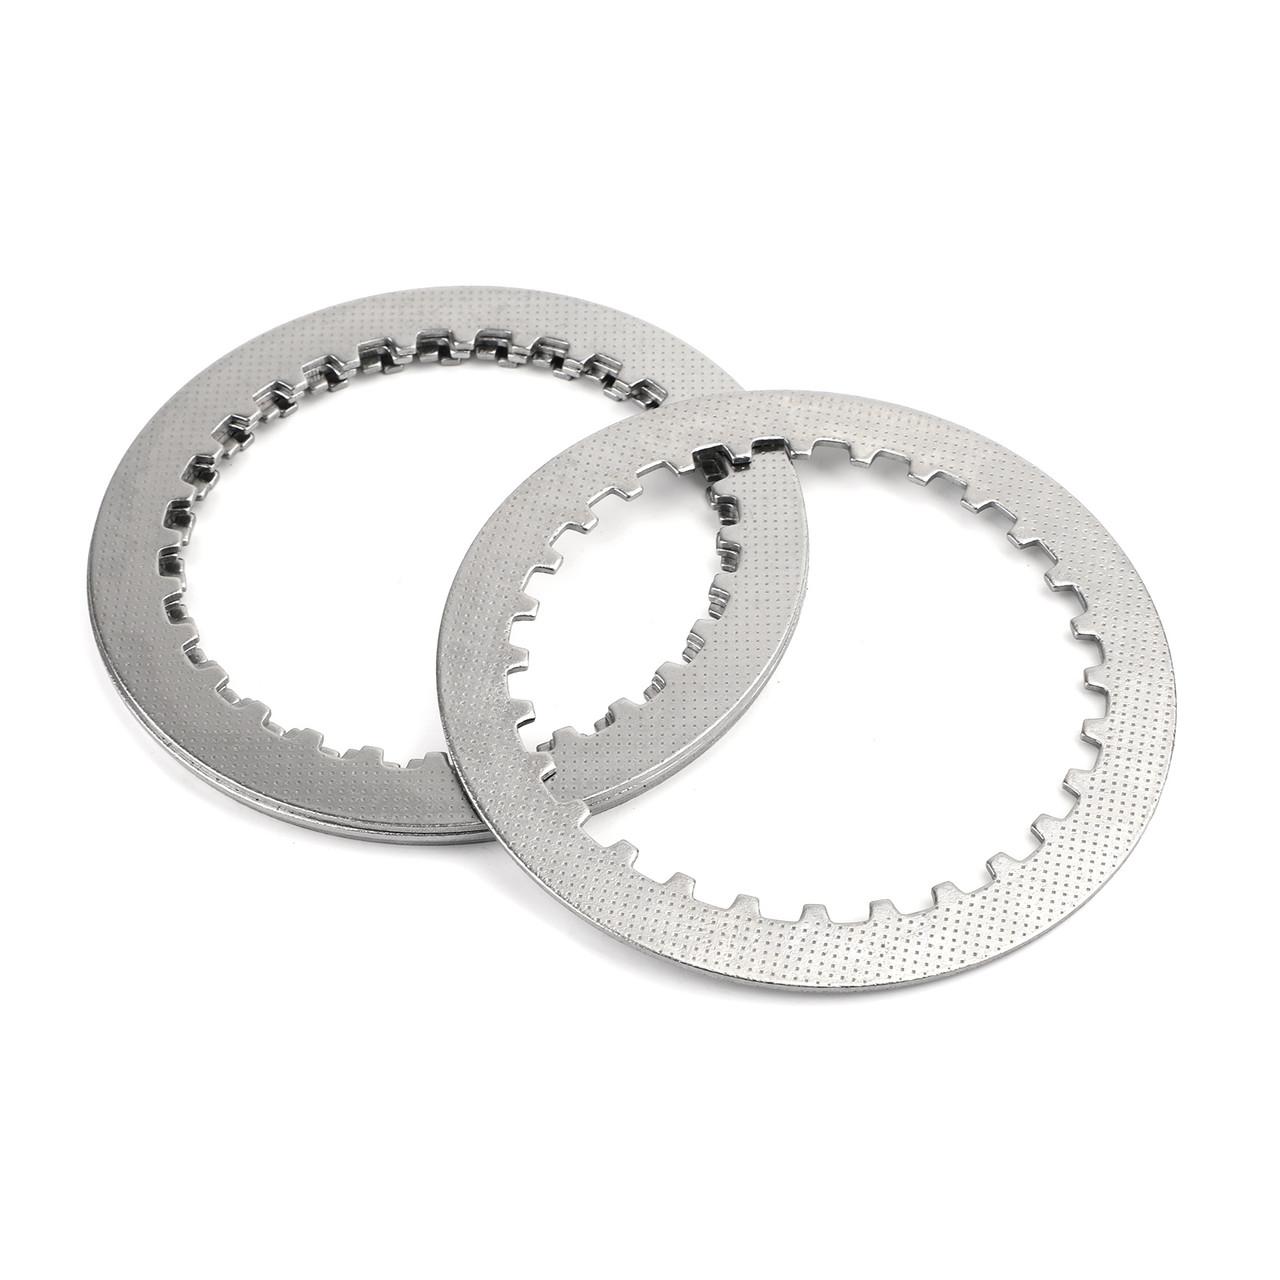 Clutch Plate Kit Fit For Honda CB500K 71-73 CB550 CB550SC A 83 CB650SC AC NIGHTHAWK 650 85